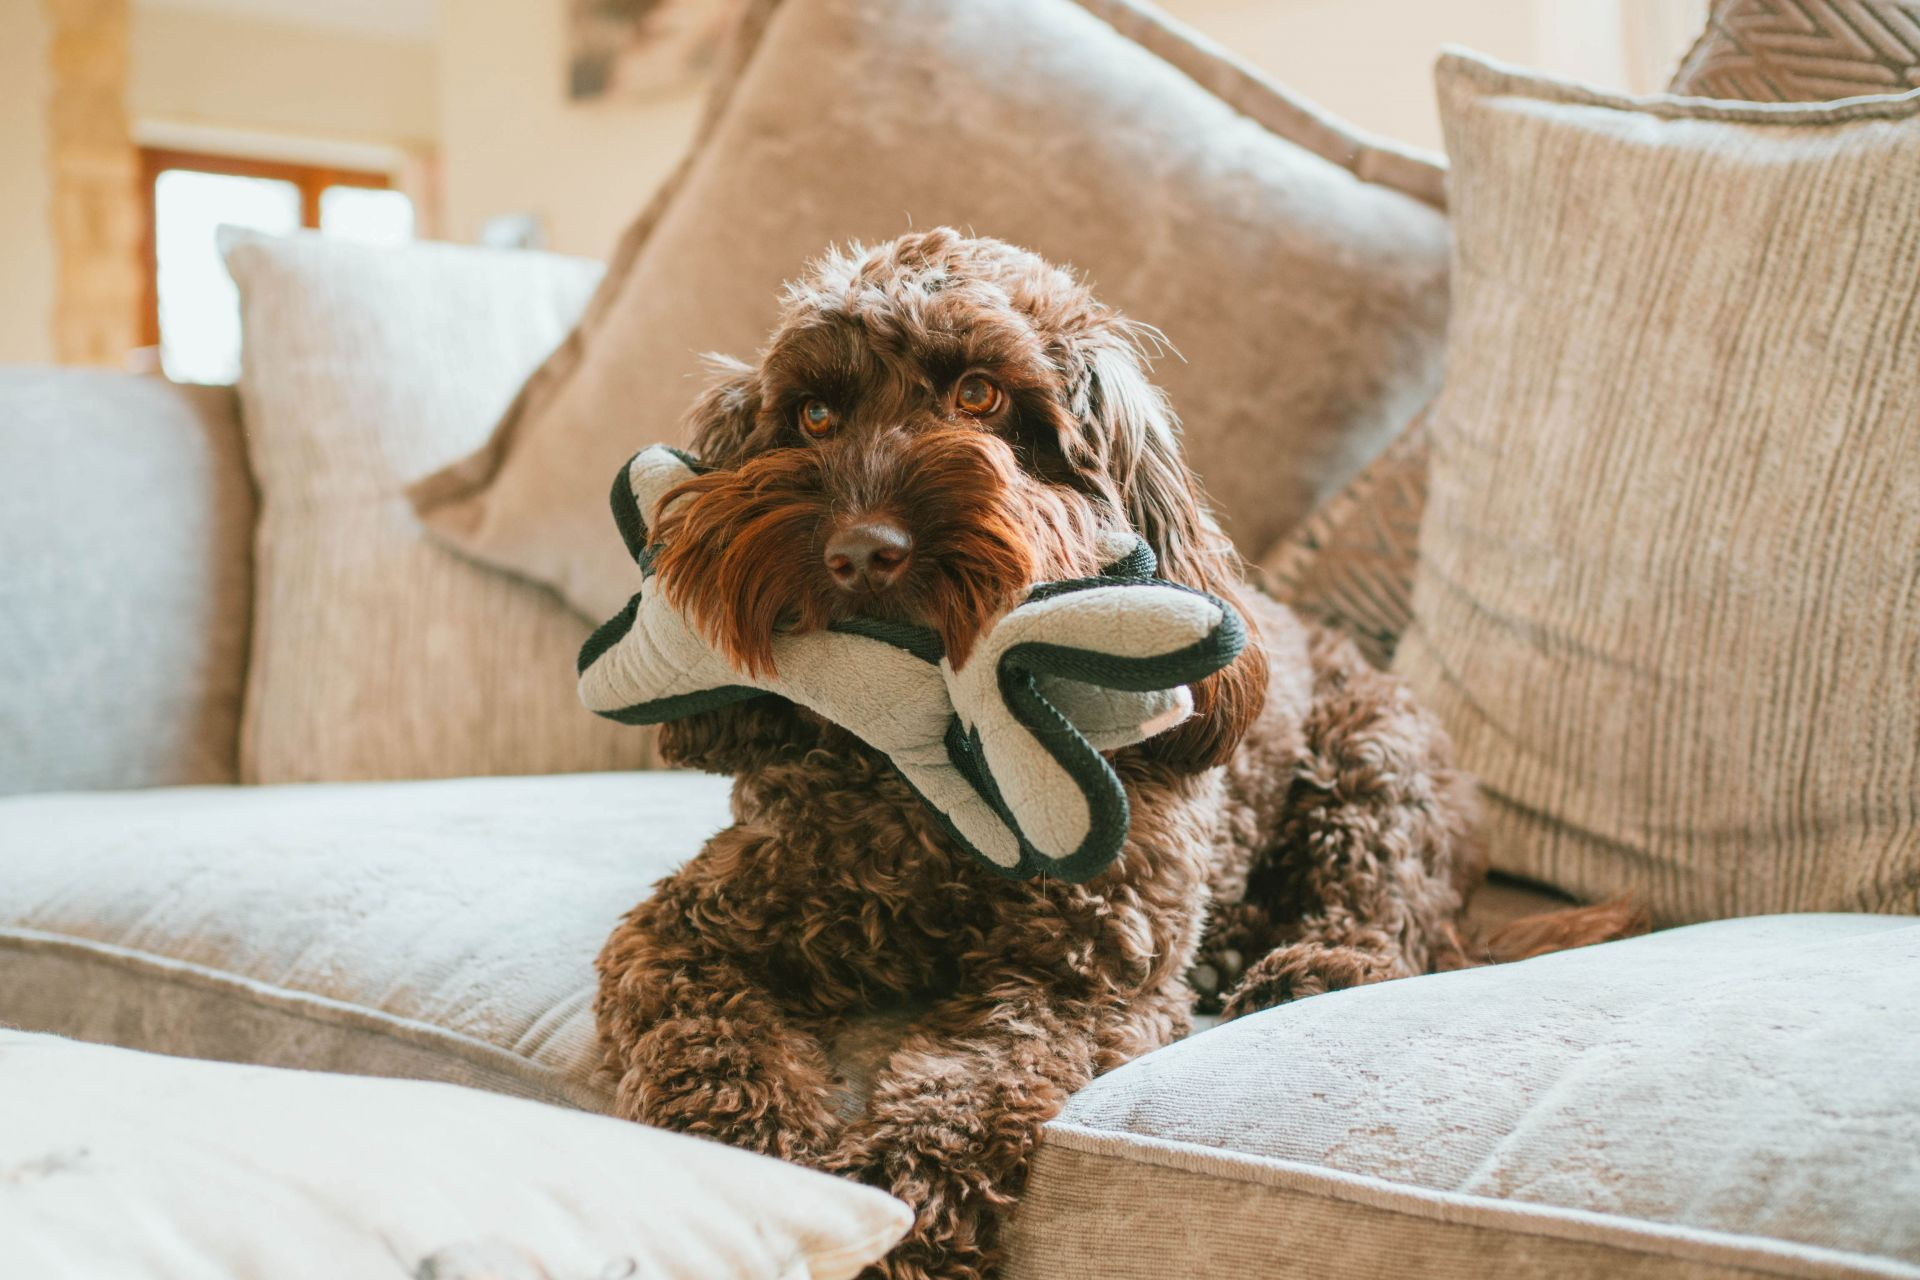 Pet Insurance by Petplan